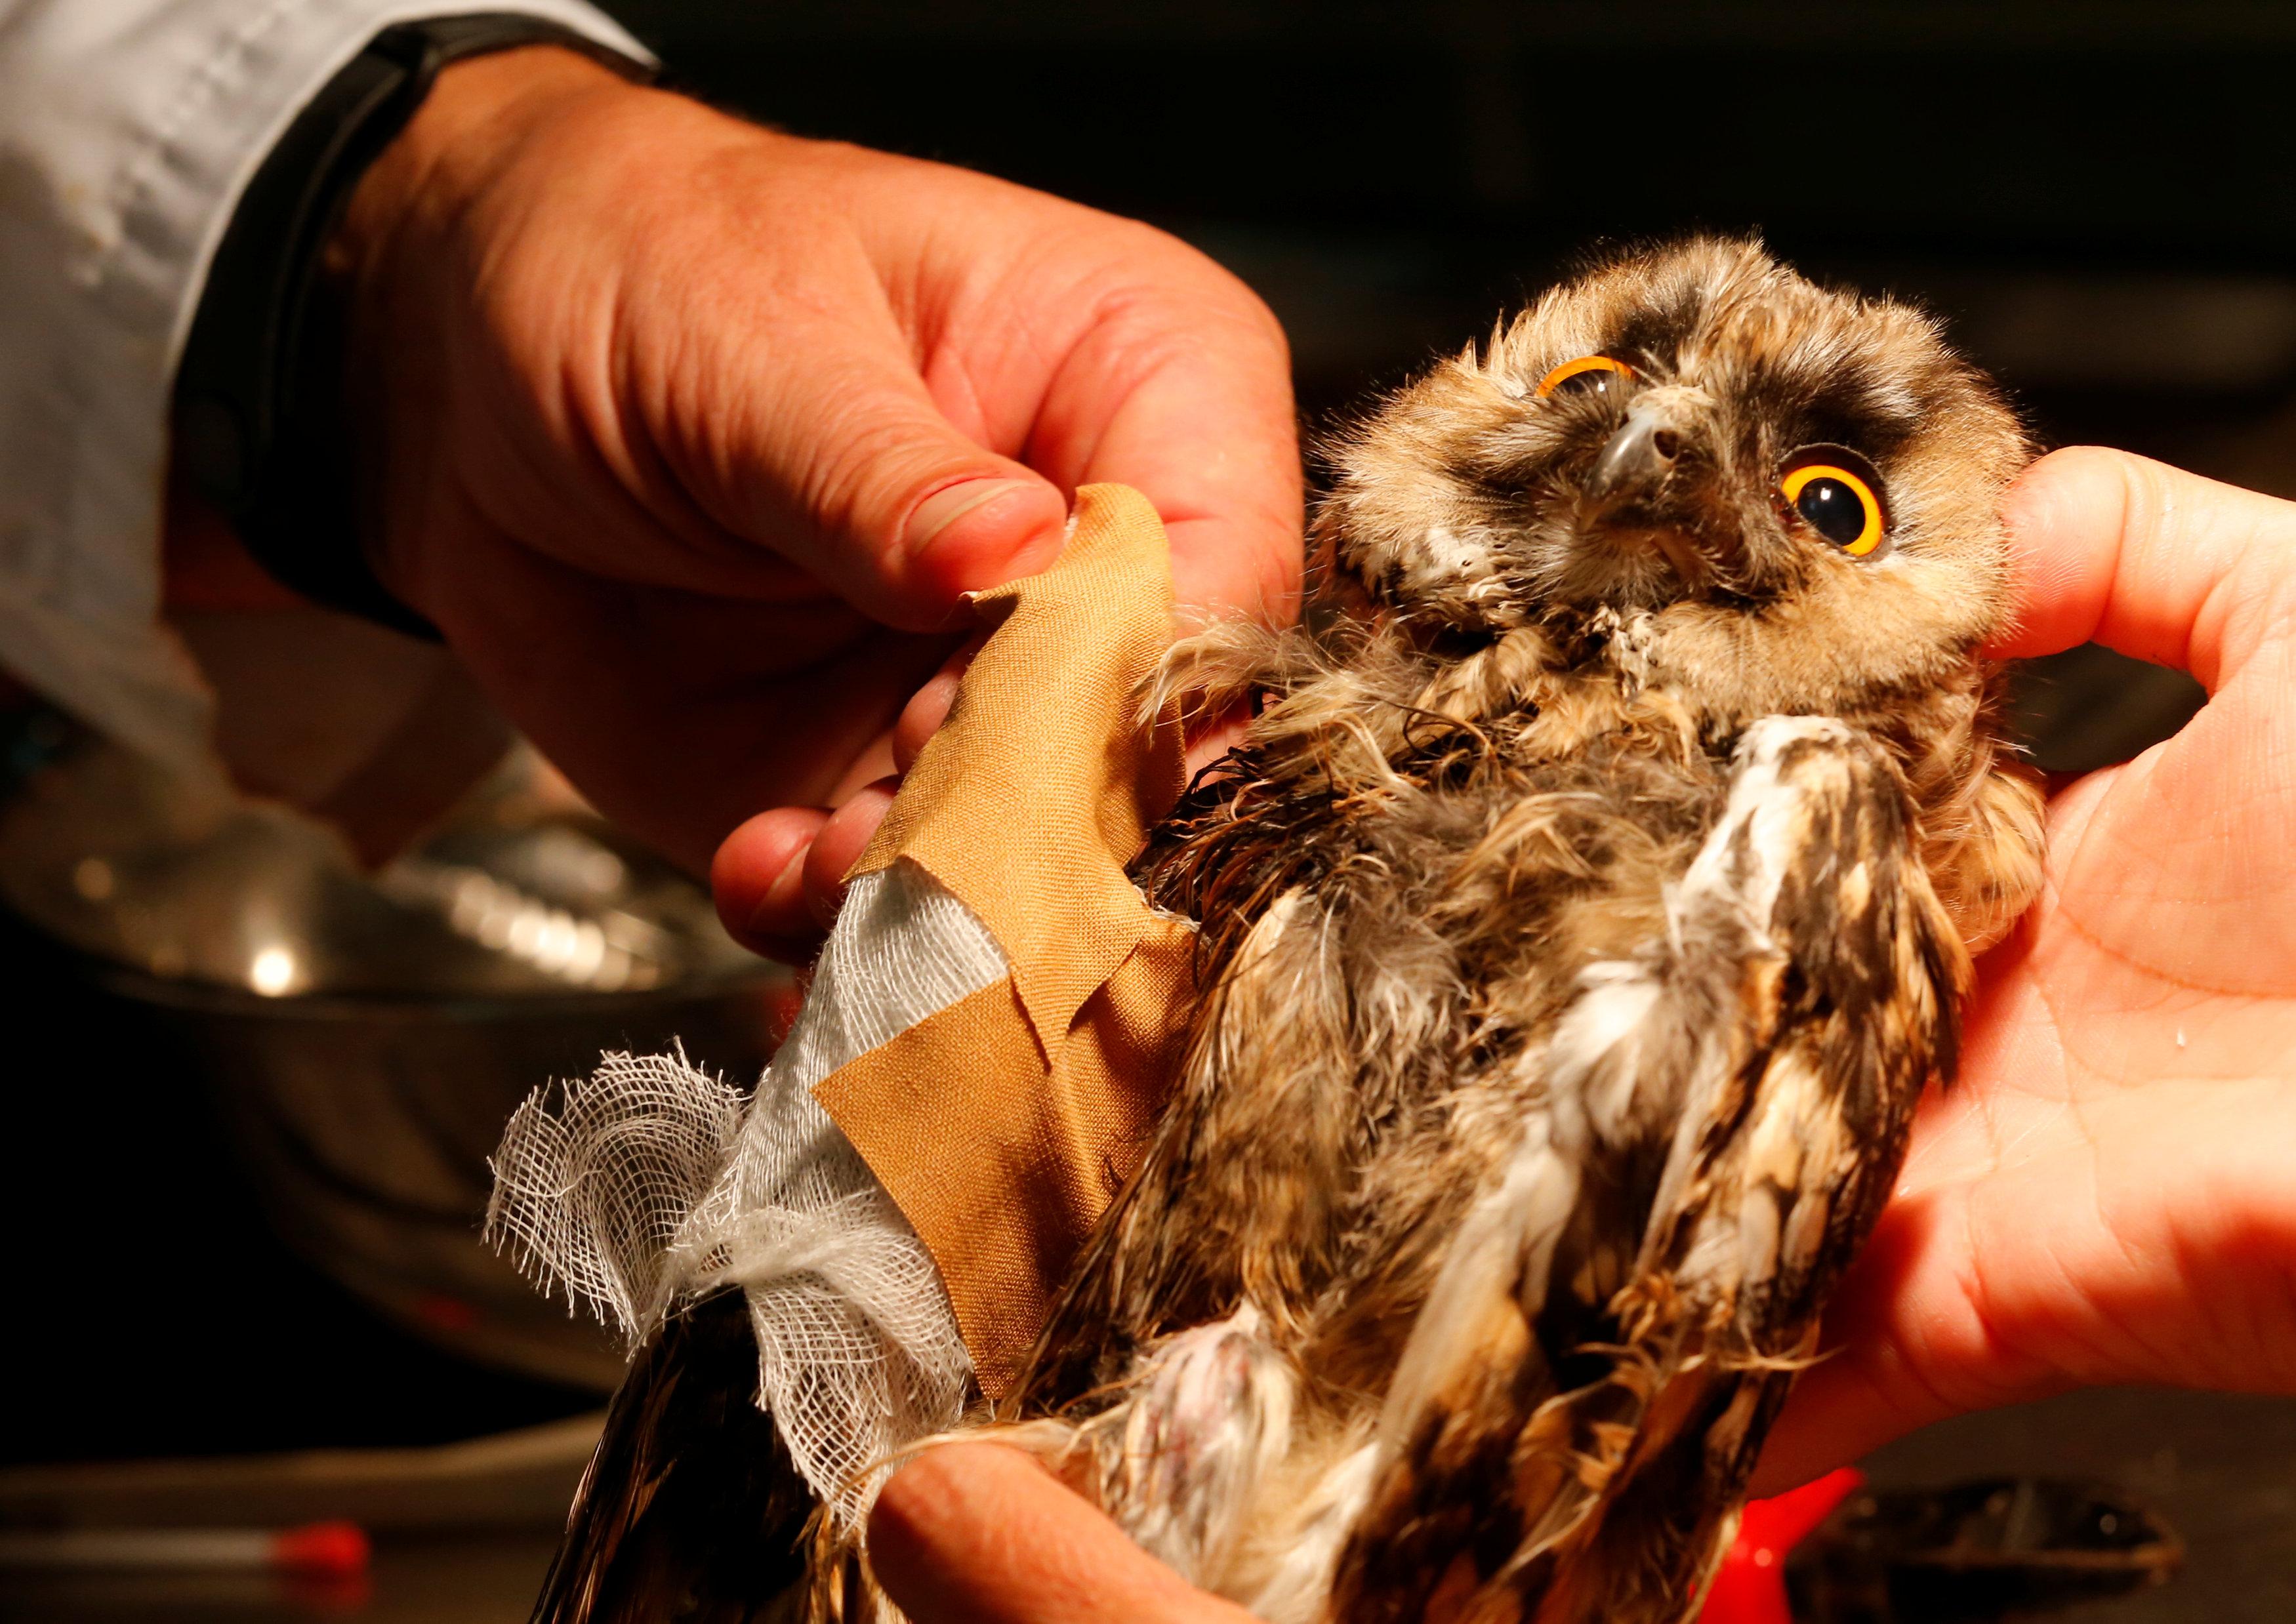 In pictures: Hungarian veterinarian treating wild birds